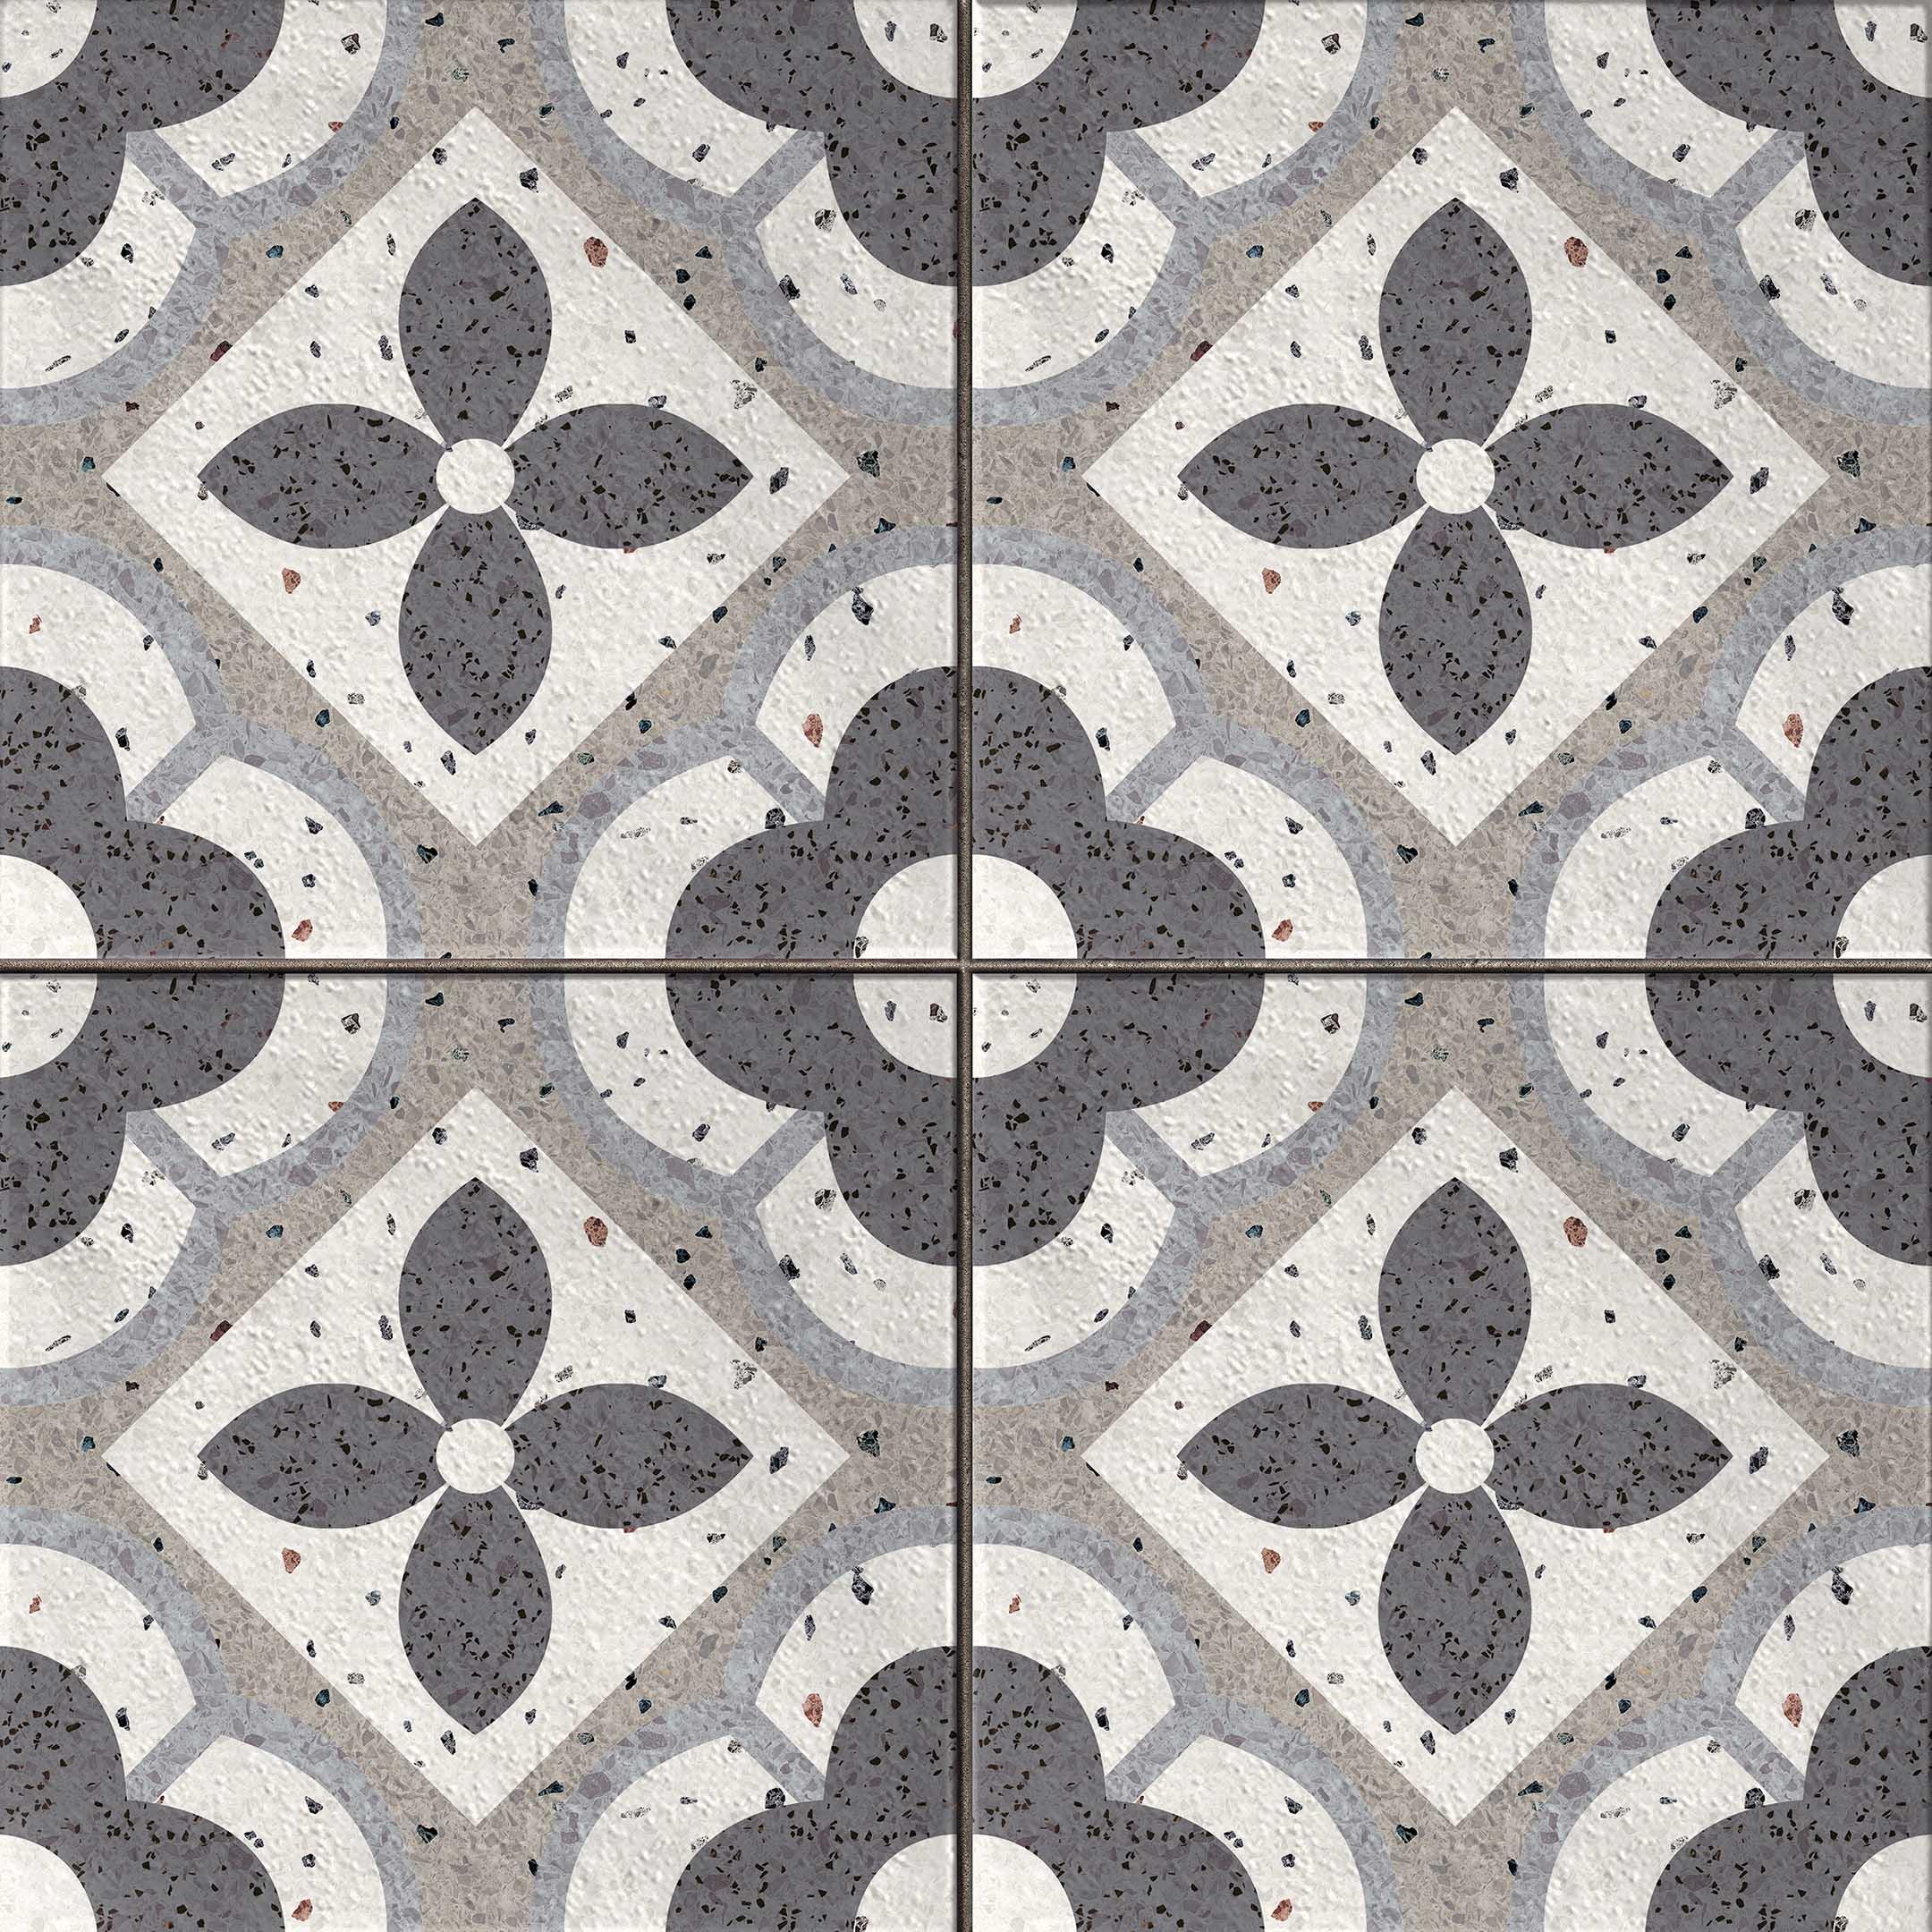 Керамогранит Cersanit Sevilla пэчворк серый 420х420х8,5 мм (9 шт.=1,58 кв.м)